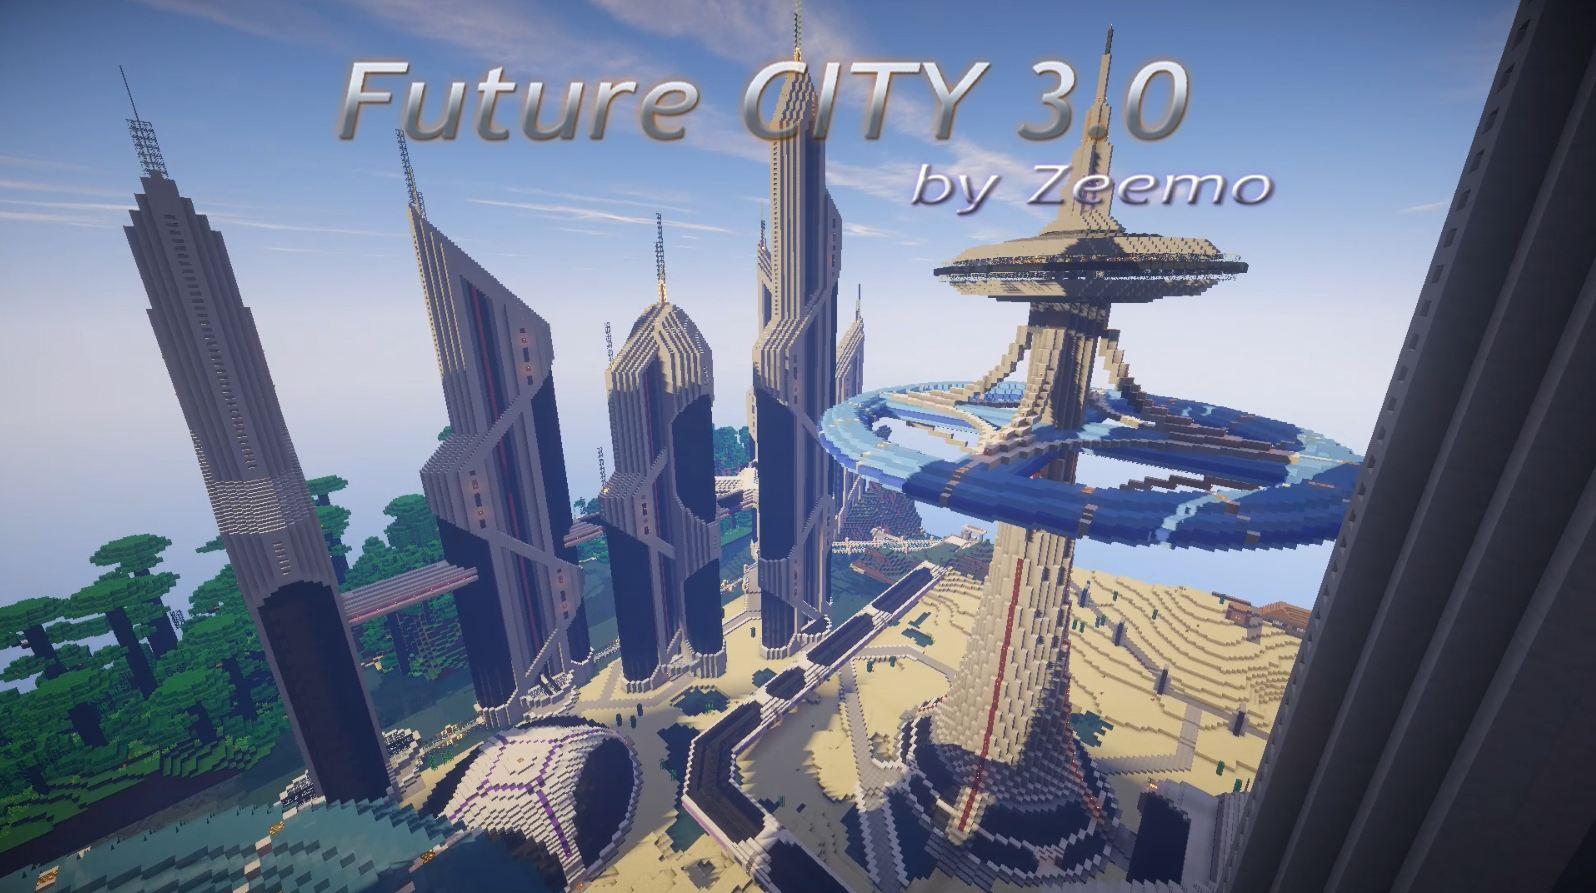 minecraft map ville future city 3.0 zeemo